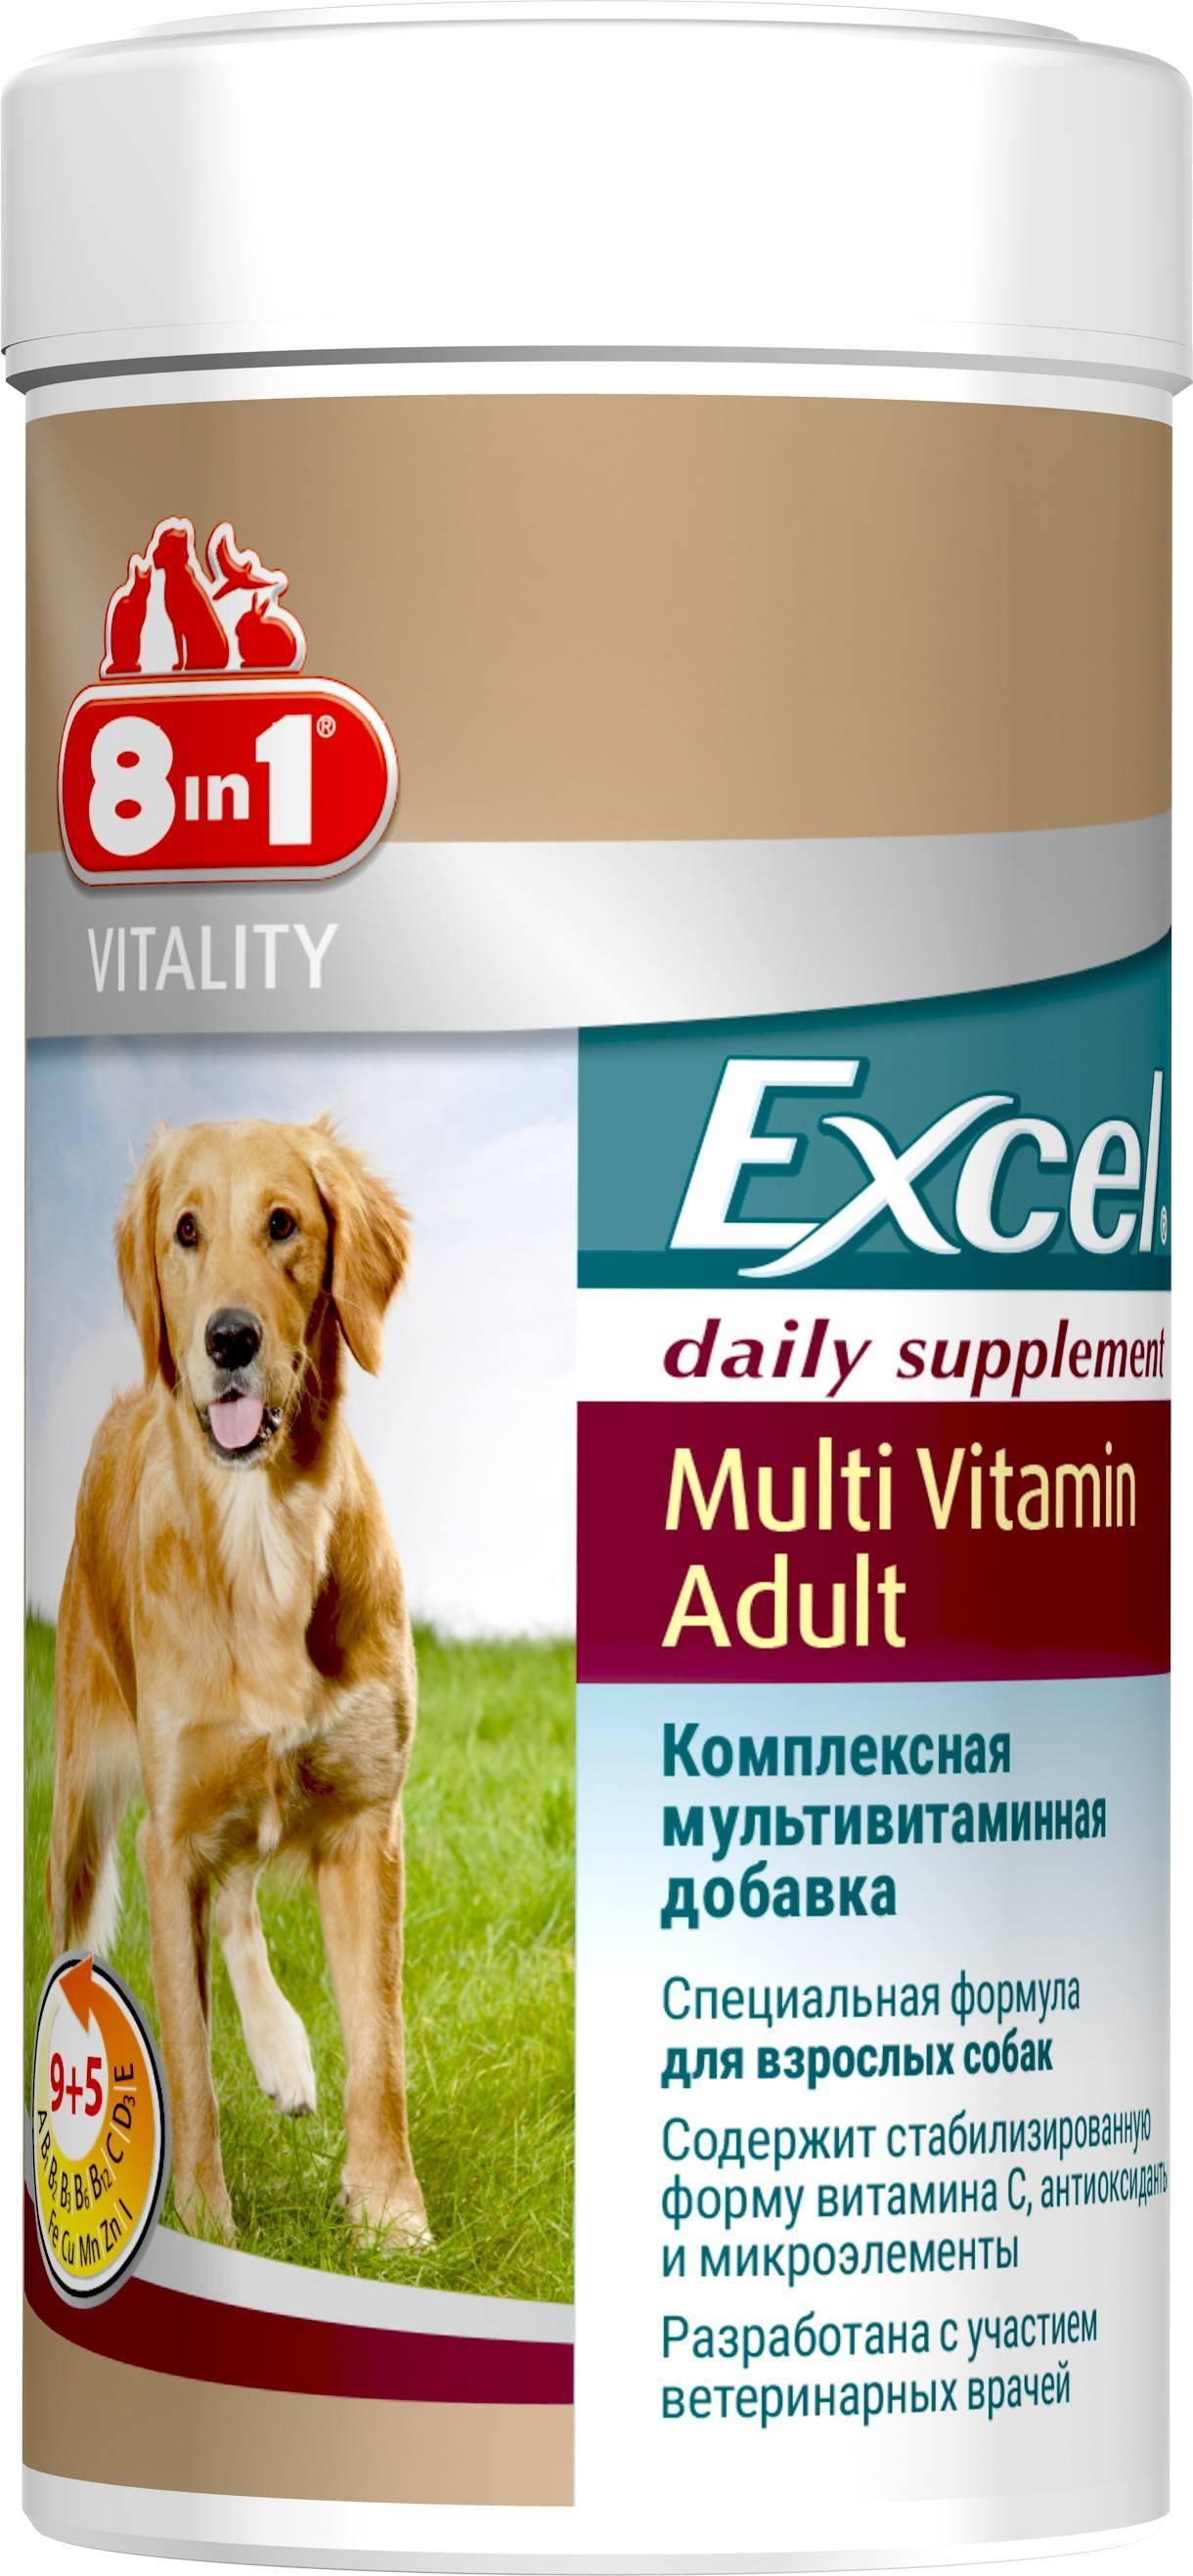 8in1 Excel Multi-Vitamin Adult Dog  – комплексная мультивитаминная добавка для взрослых собак